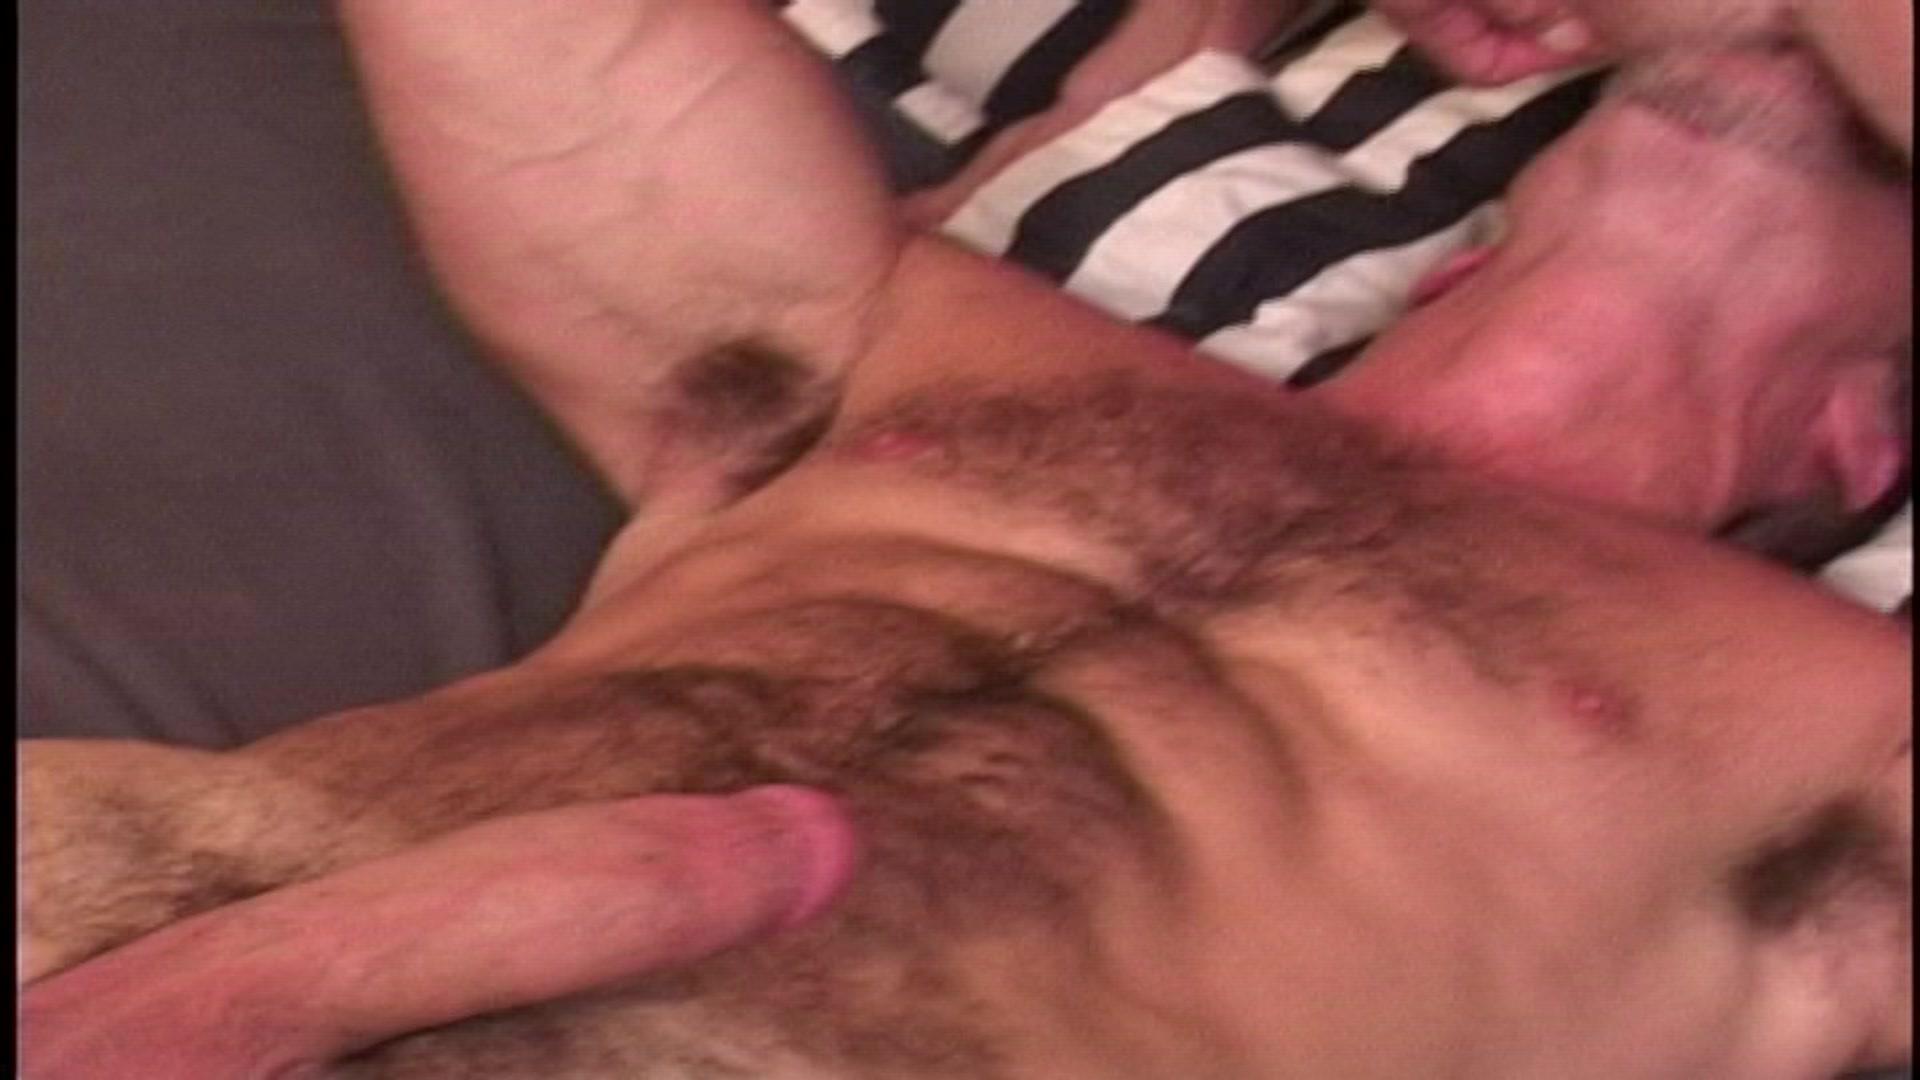 Colton lays garrett down on his back sliding his dick inside